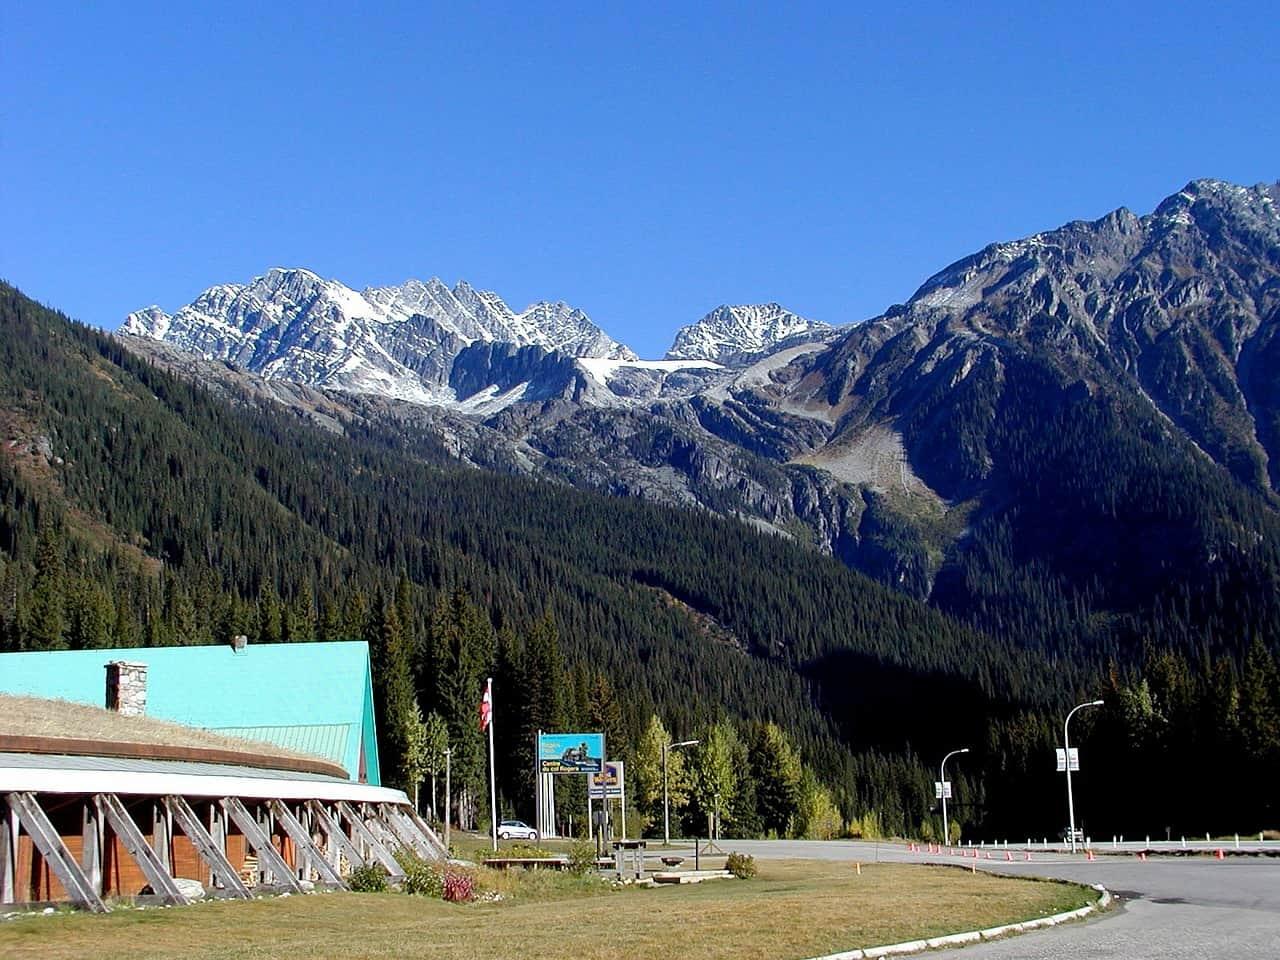 rogers pass montana, montana facts